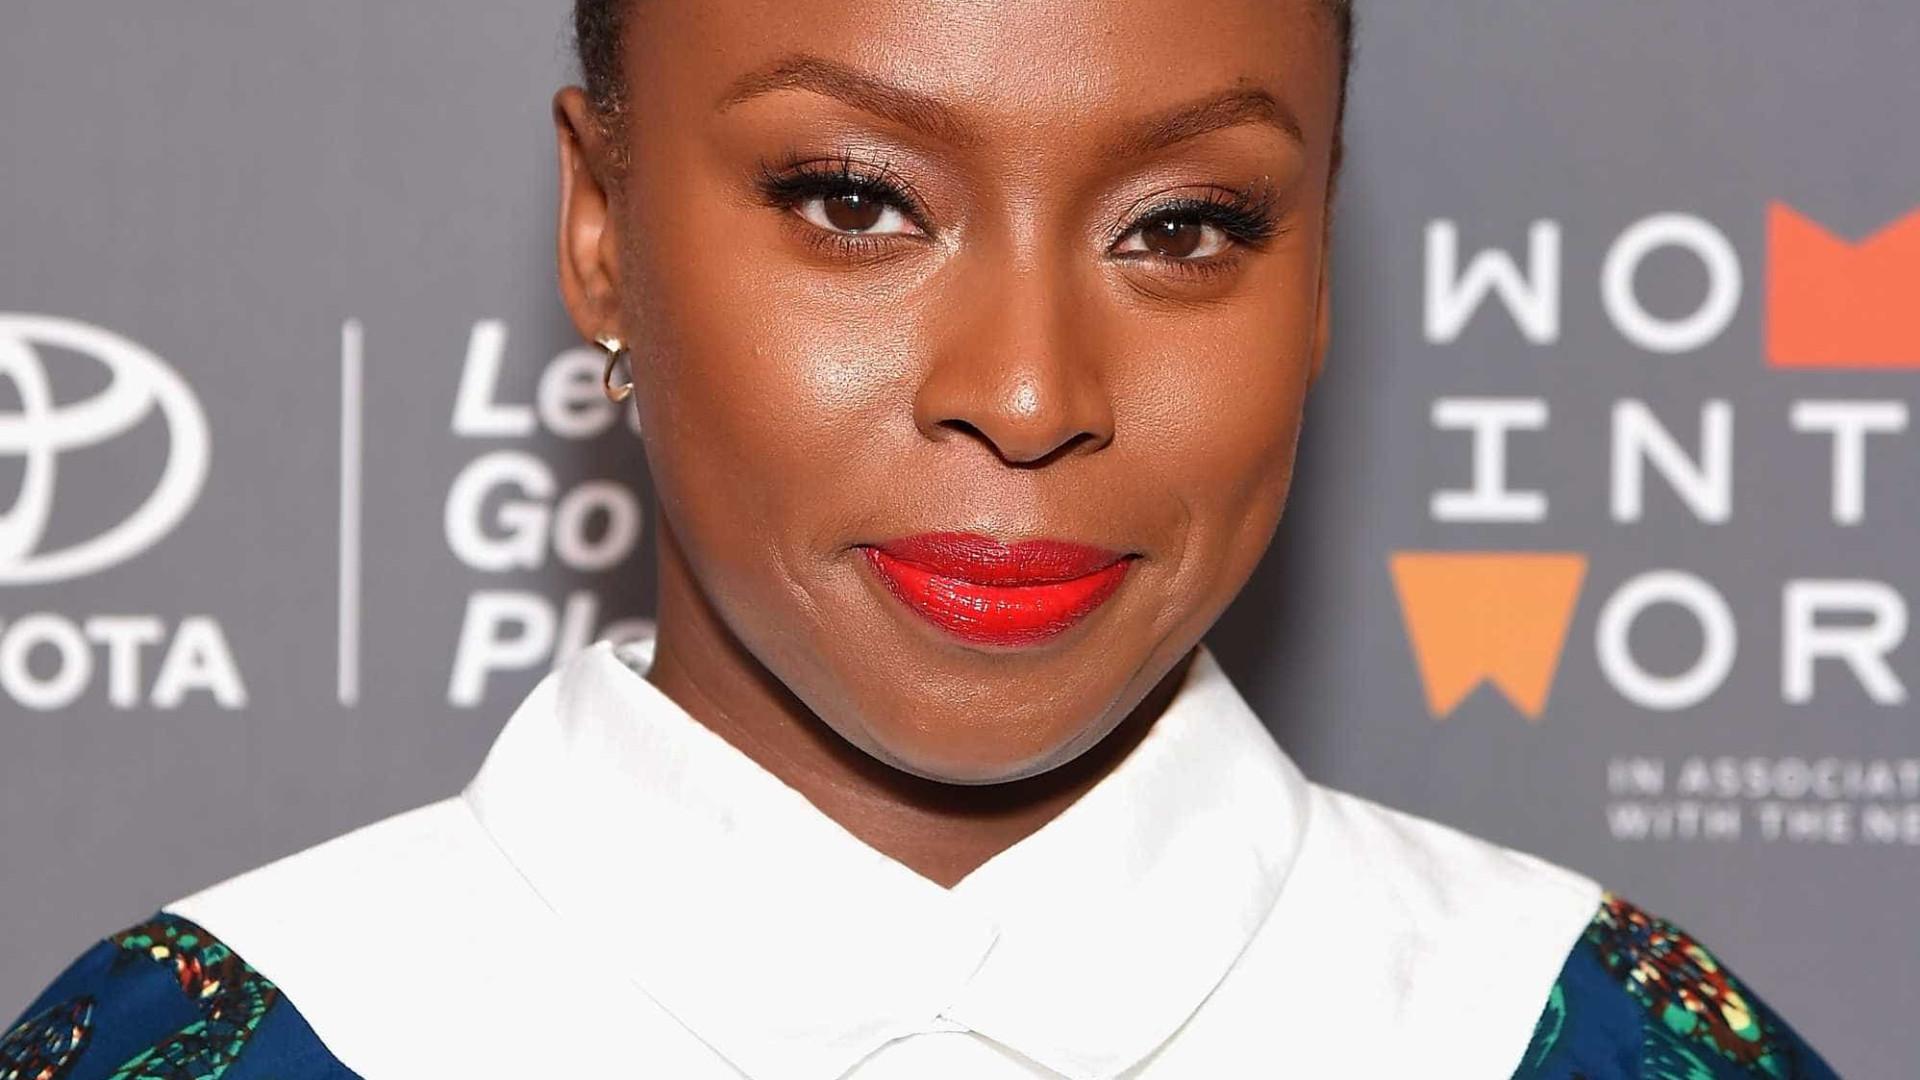 Chimamanda Ngozi Adichie vence o prêmio PEN Pinter